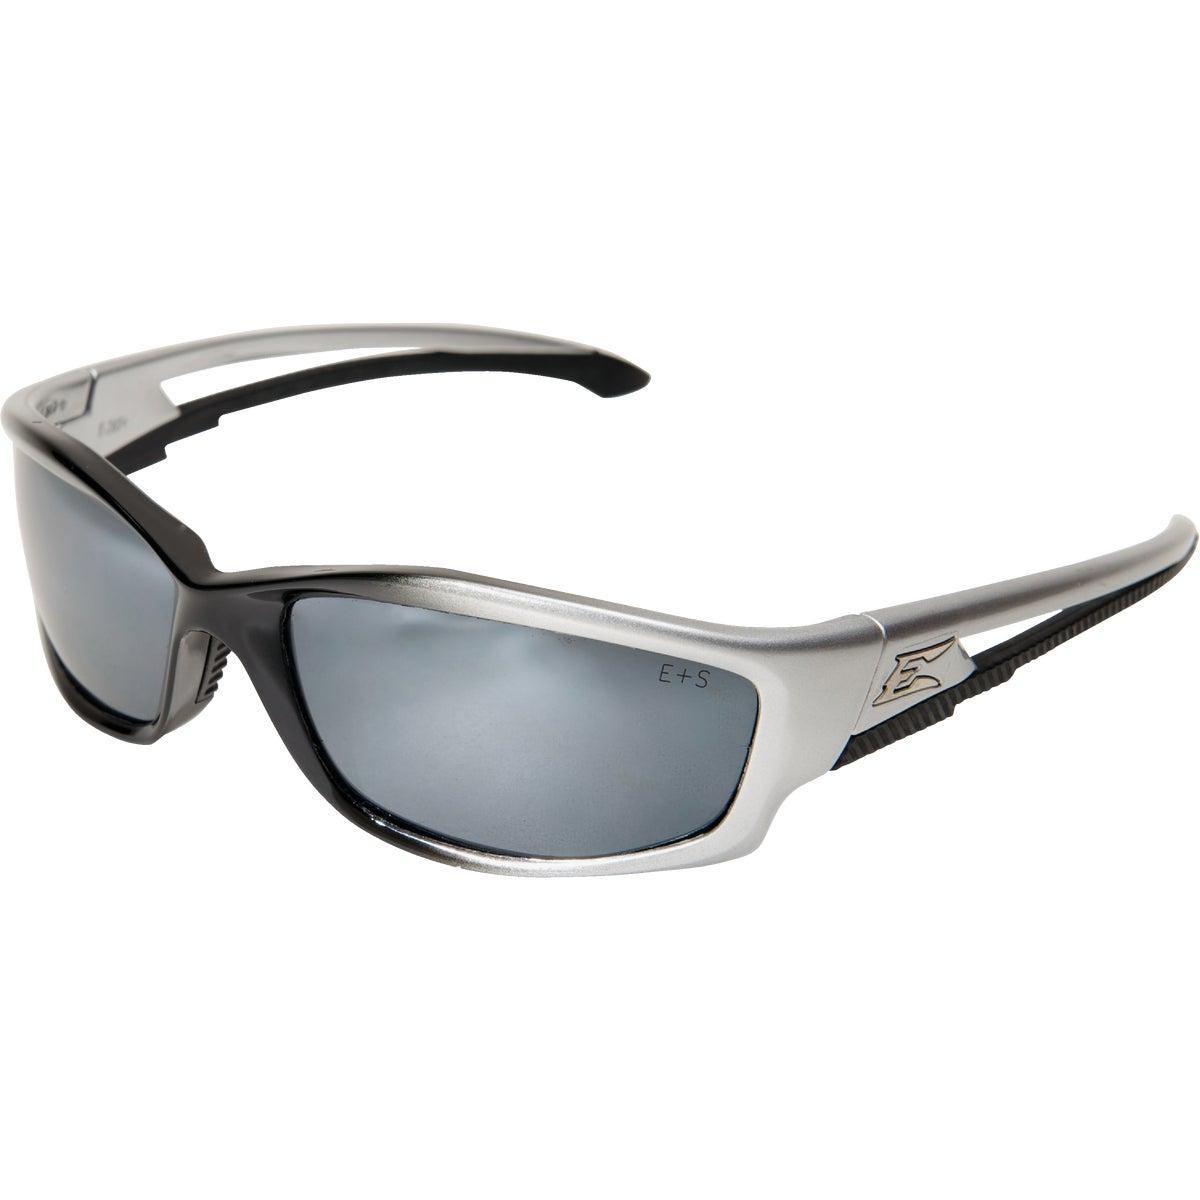 KAZBEK BLK/SLVR MIR LENS - SK117 by Edge Eyewear